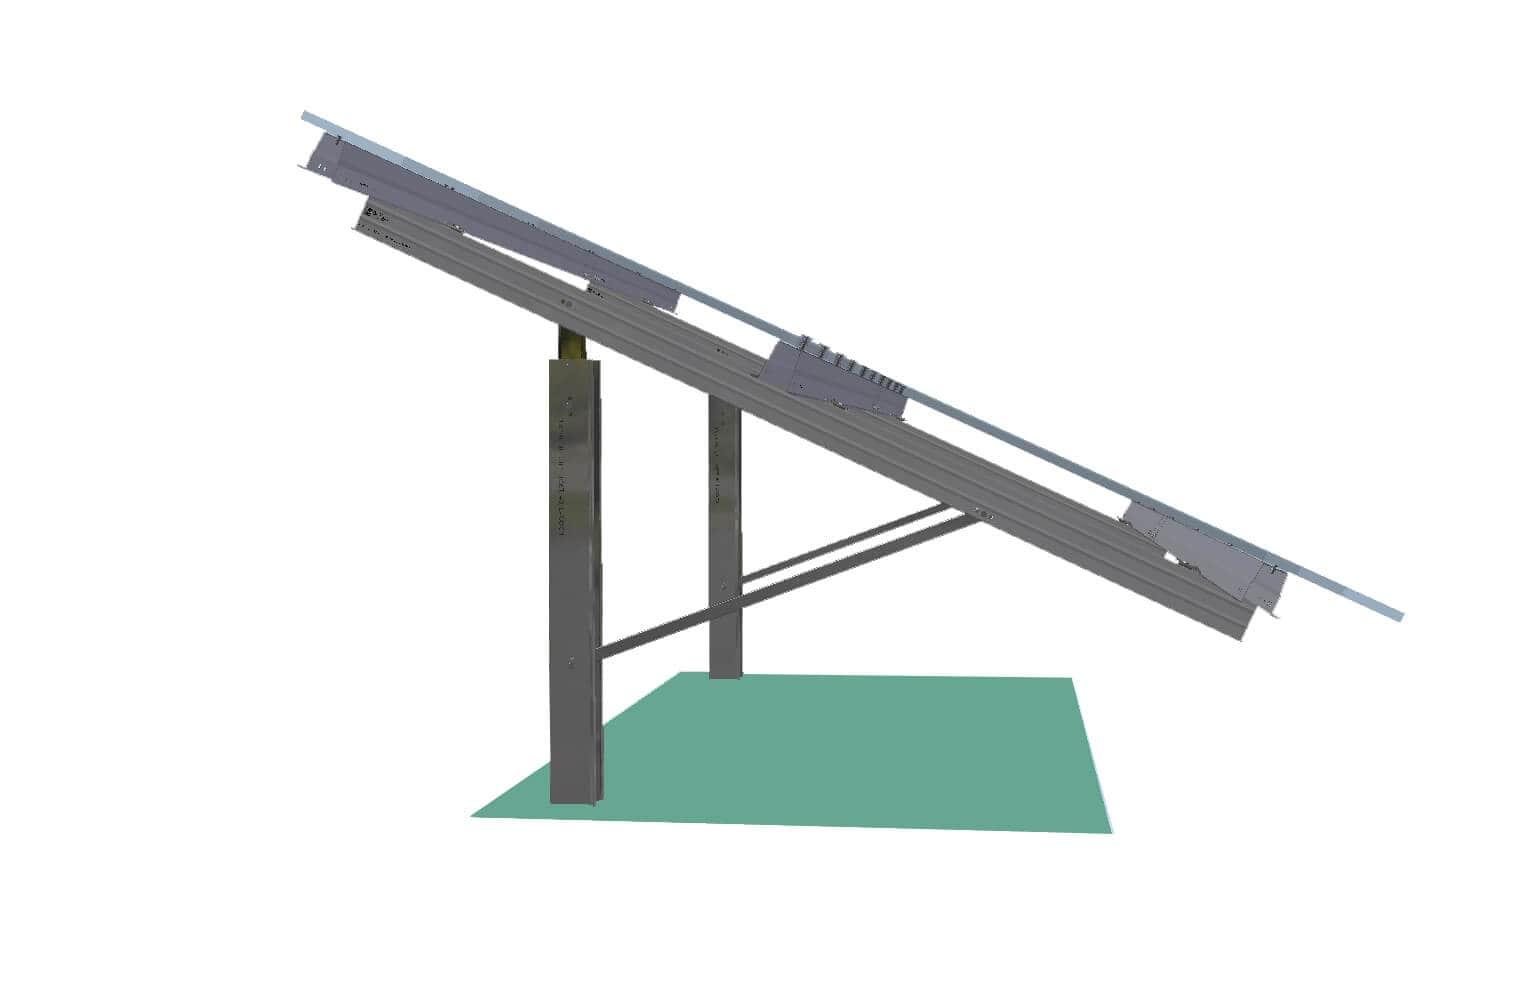 Schletter Schletter Unveils G-Max Fixed-Tilt Solar Mounting System